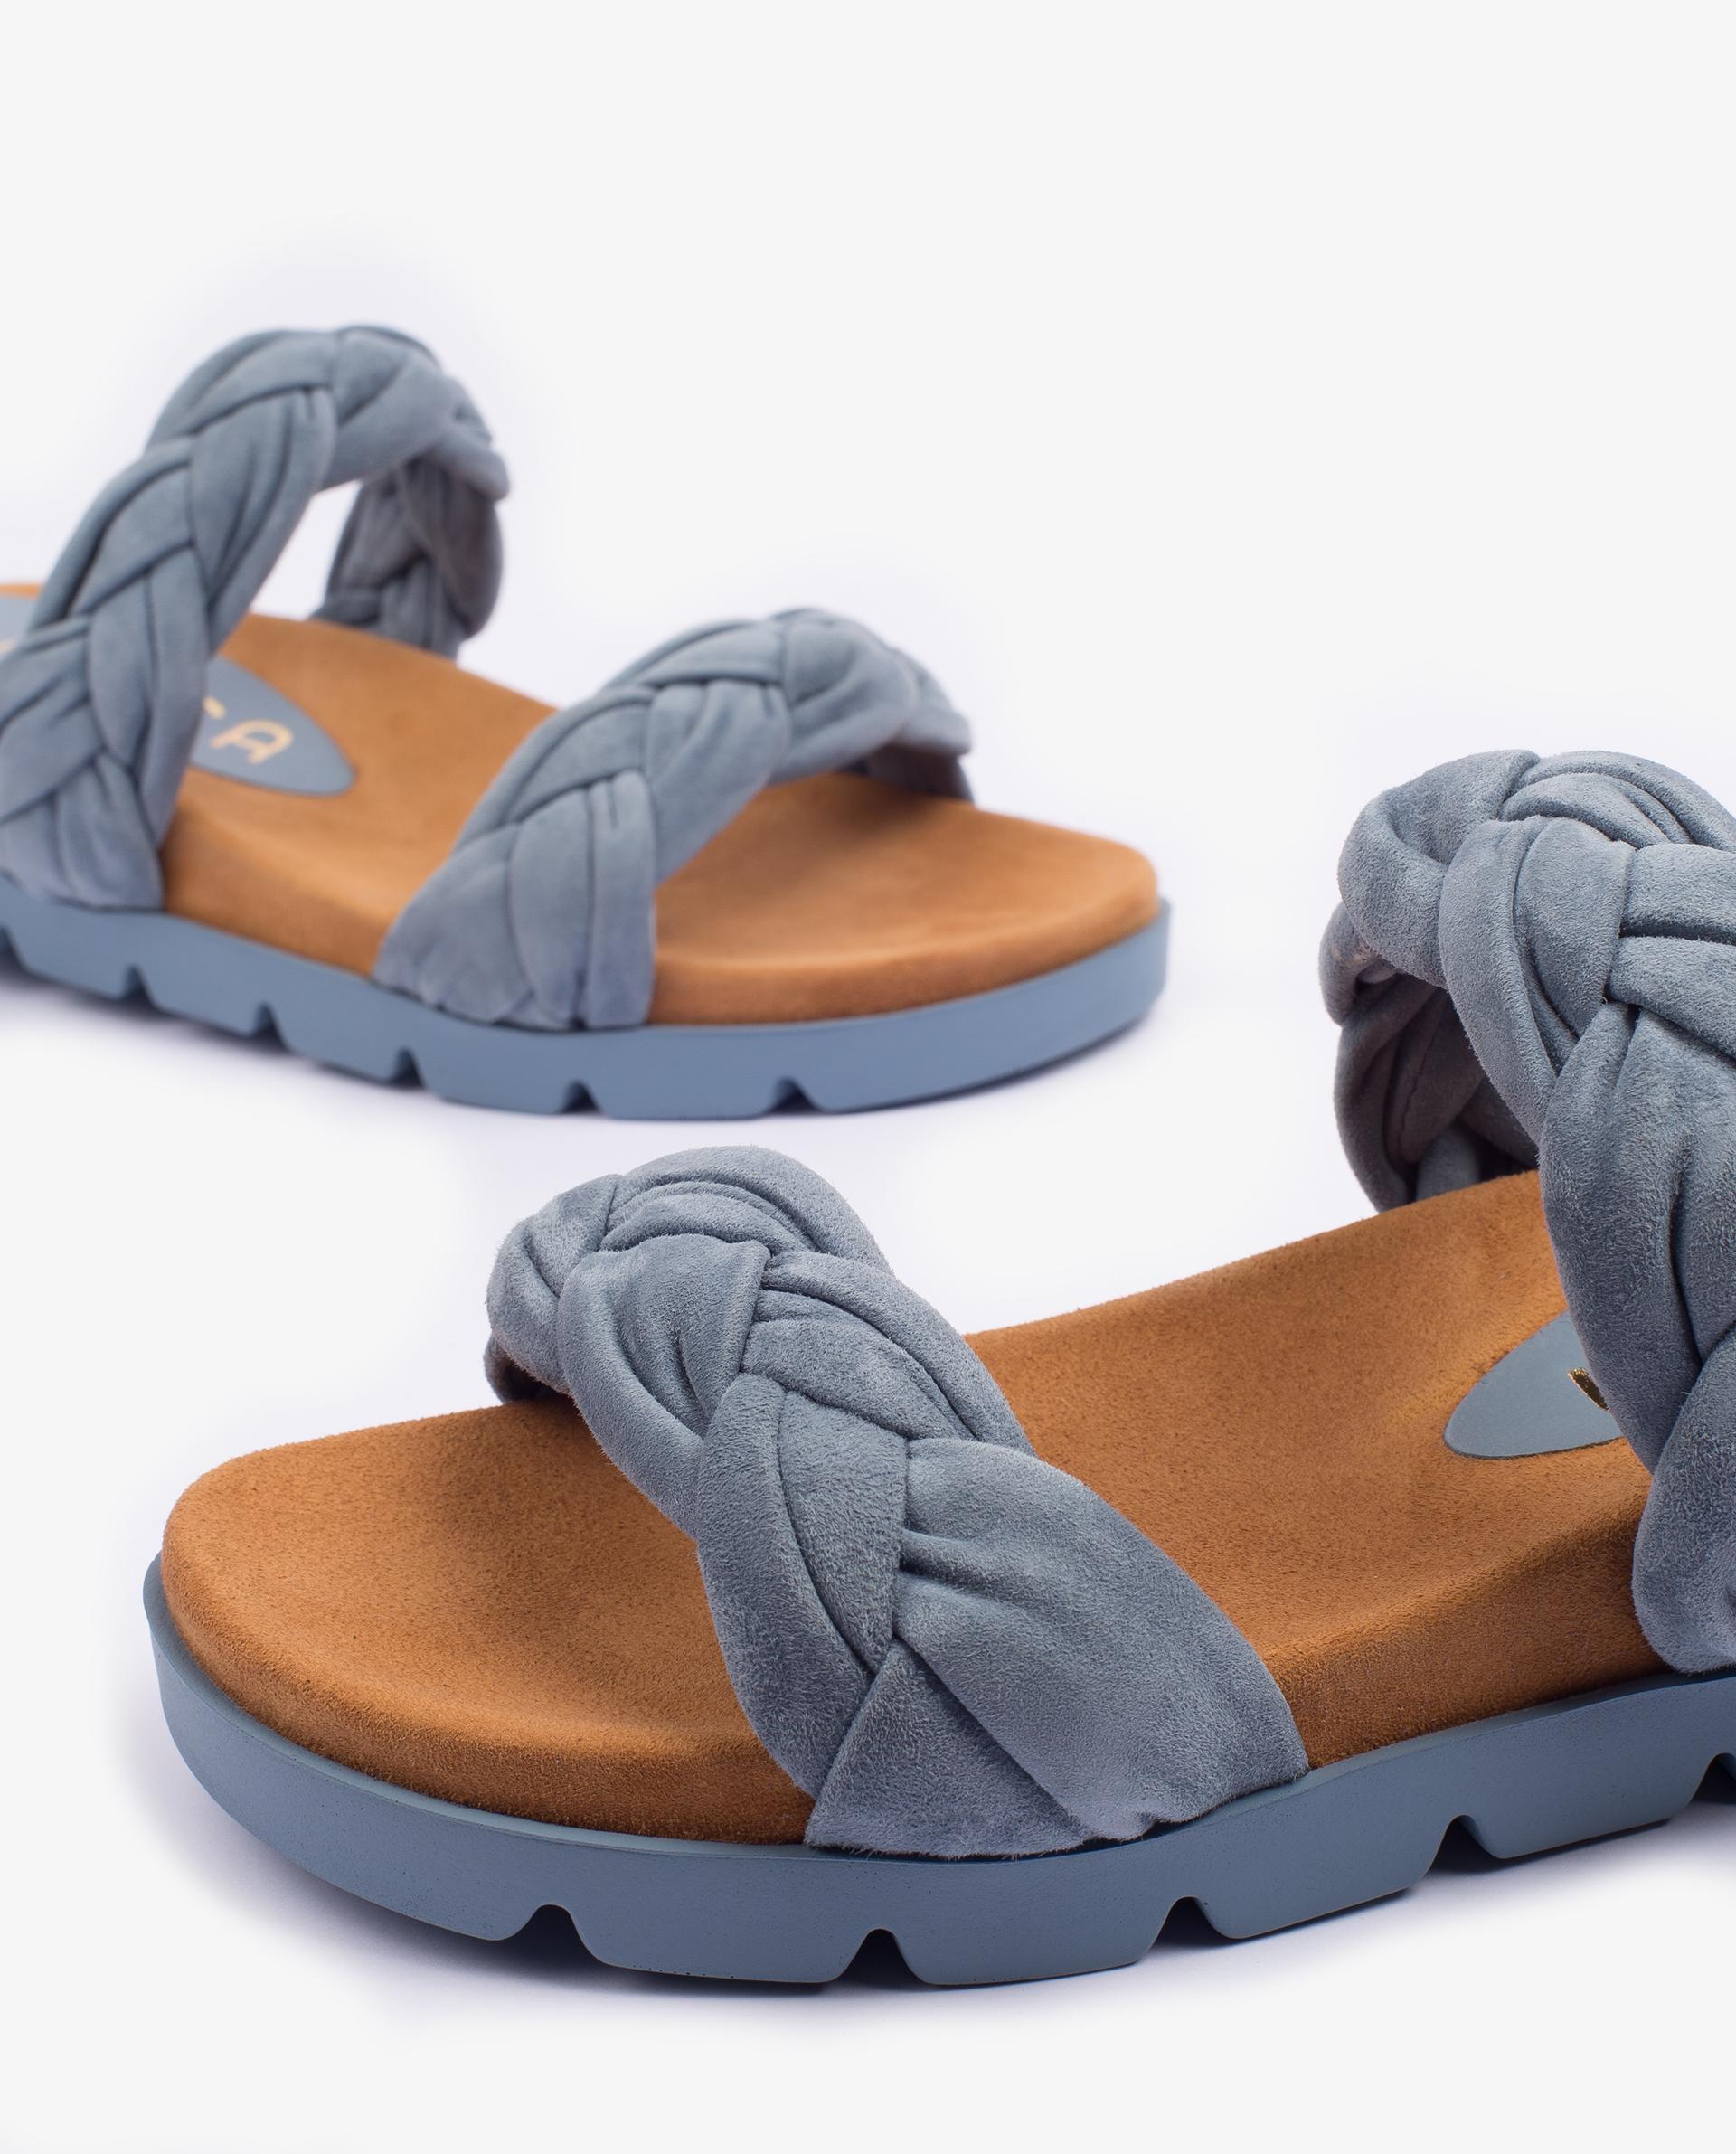 UNISA Flat kid suede sandals with braided straps CAIRO_KS 5